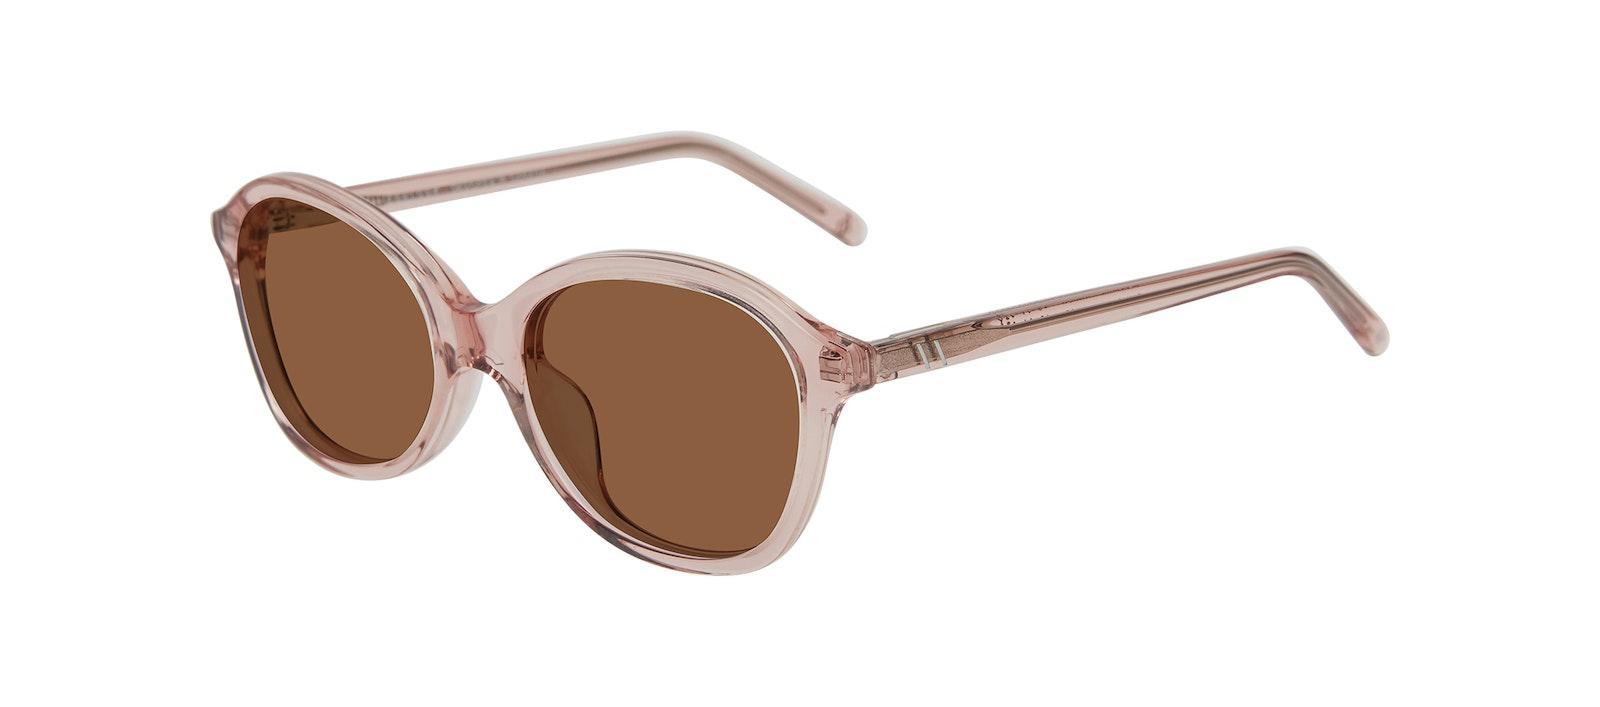 Affordable Fashion Glasses Square Sunglasses Kids Play Junior Pink Tilt